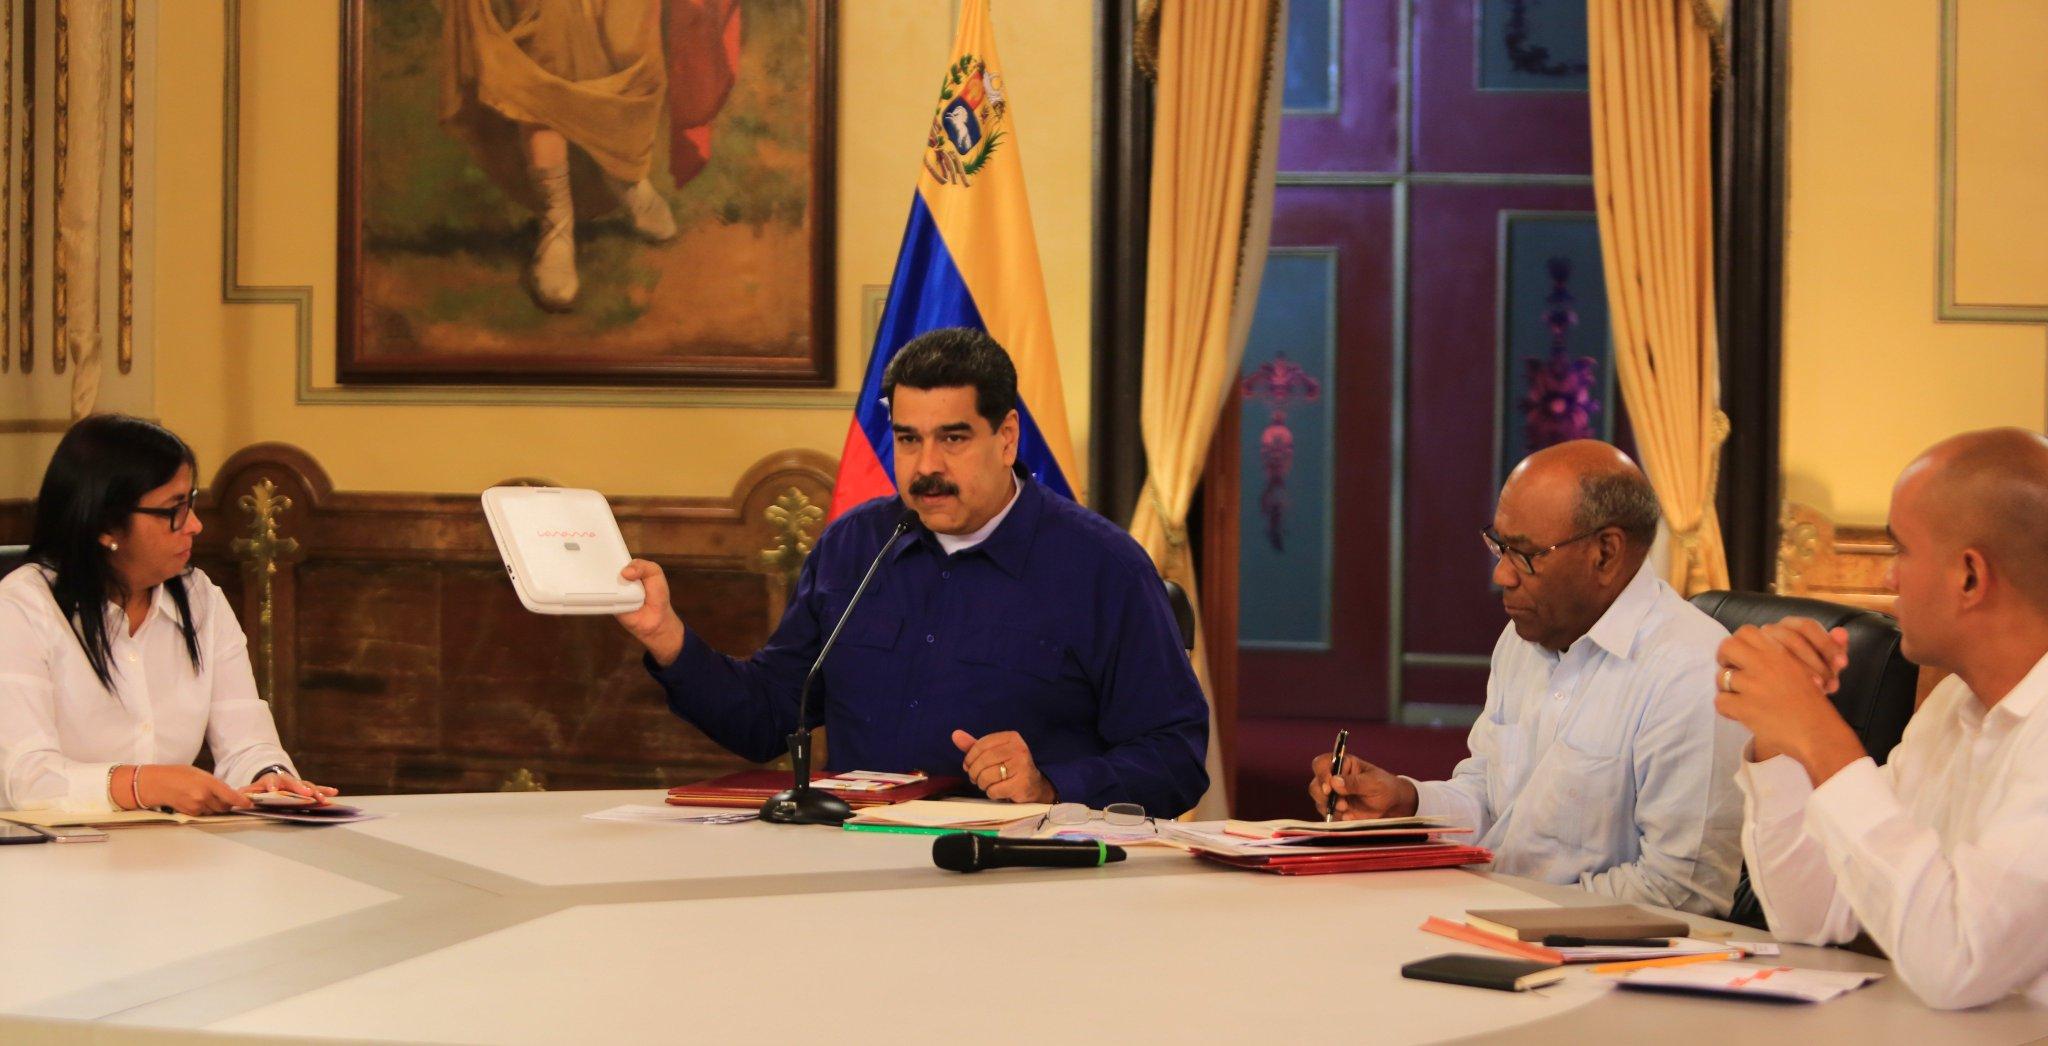 #Noticia �� | Presidente @NicolasMaduro celebró inicio de período escolar 2018-2019 https://t.co/cc0vR8d6Pc https://t.co/gvrUz71EQX